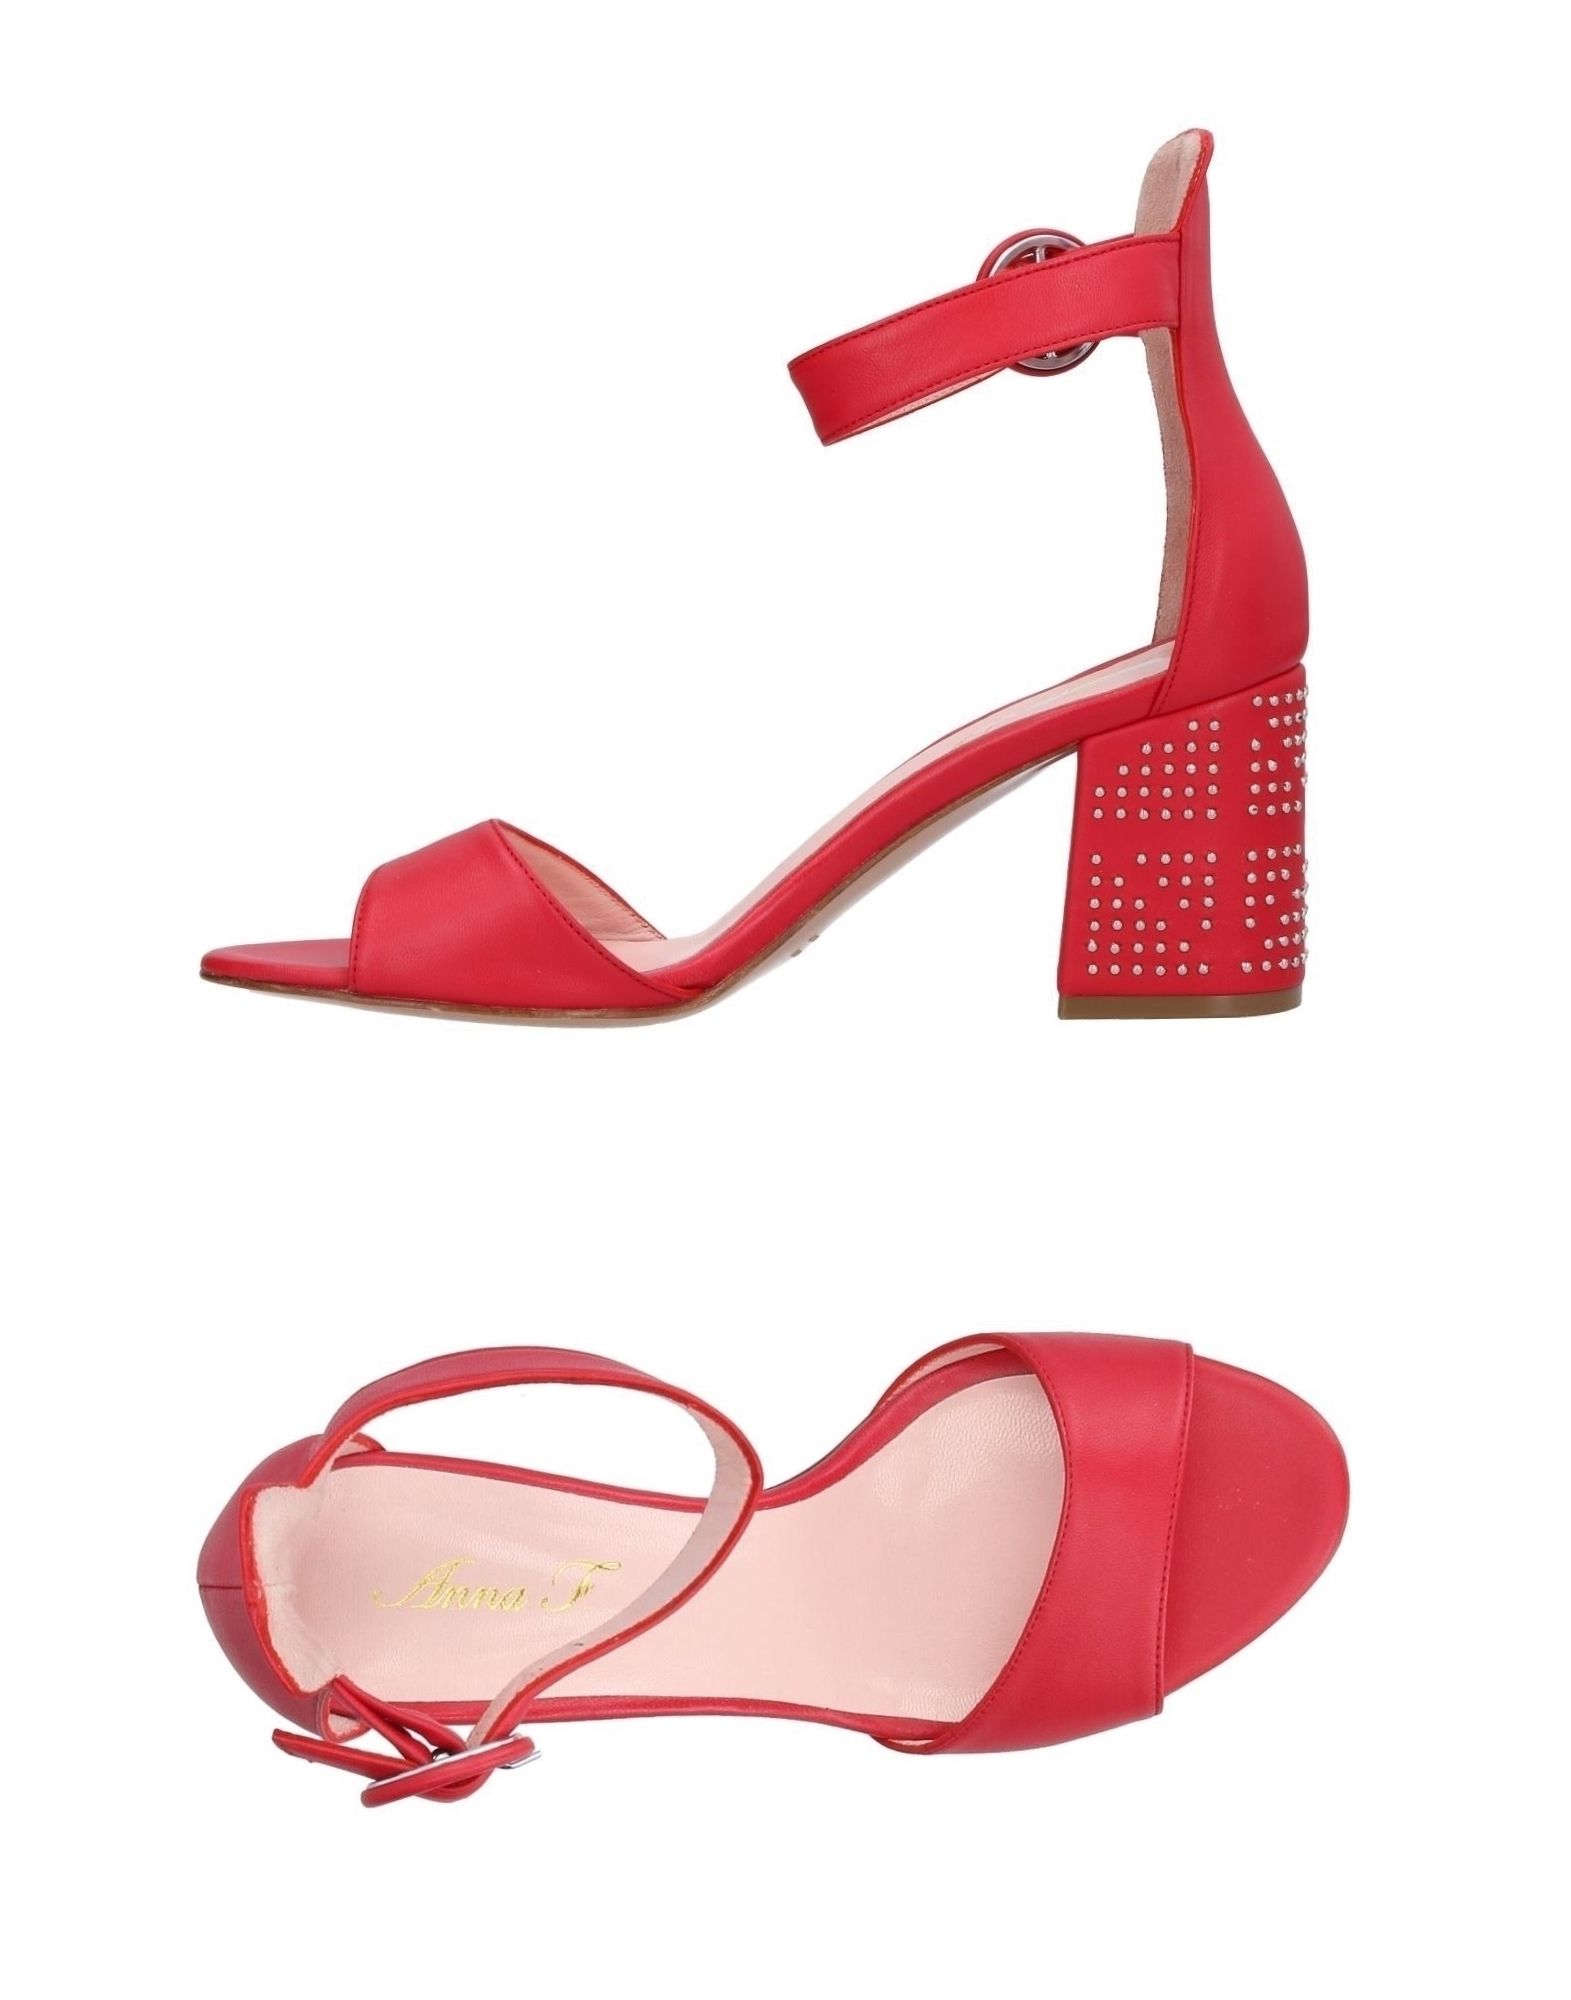 Anna F. Sandalen Damen  11400635ED Gute Qualität beliebte Schuhe